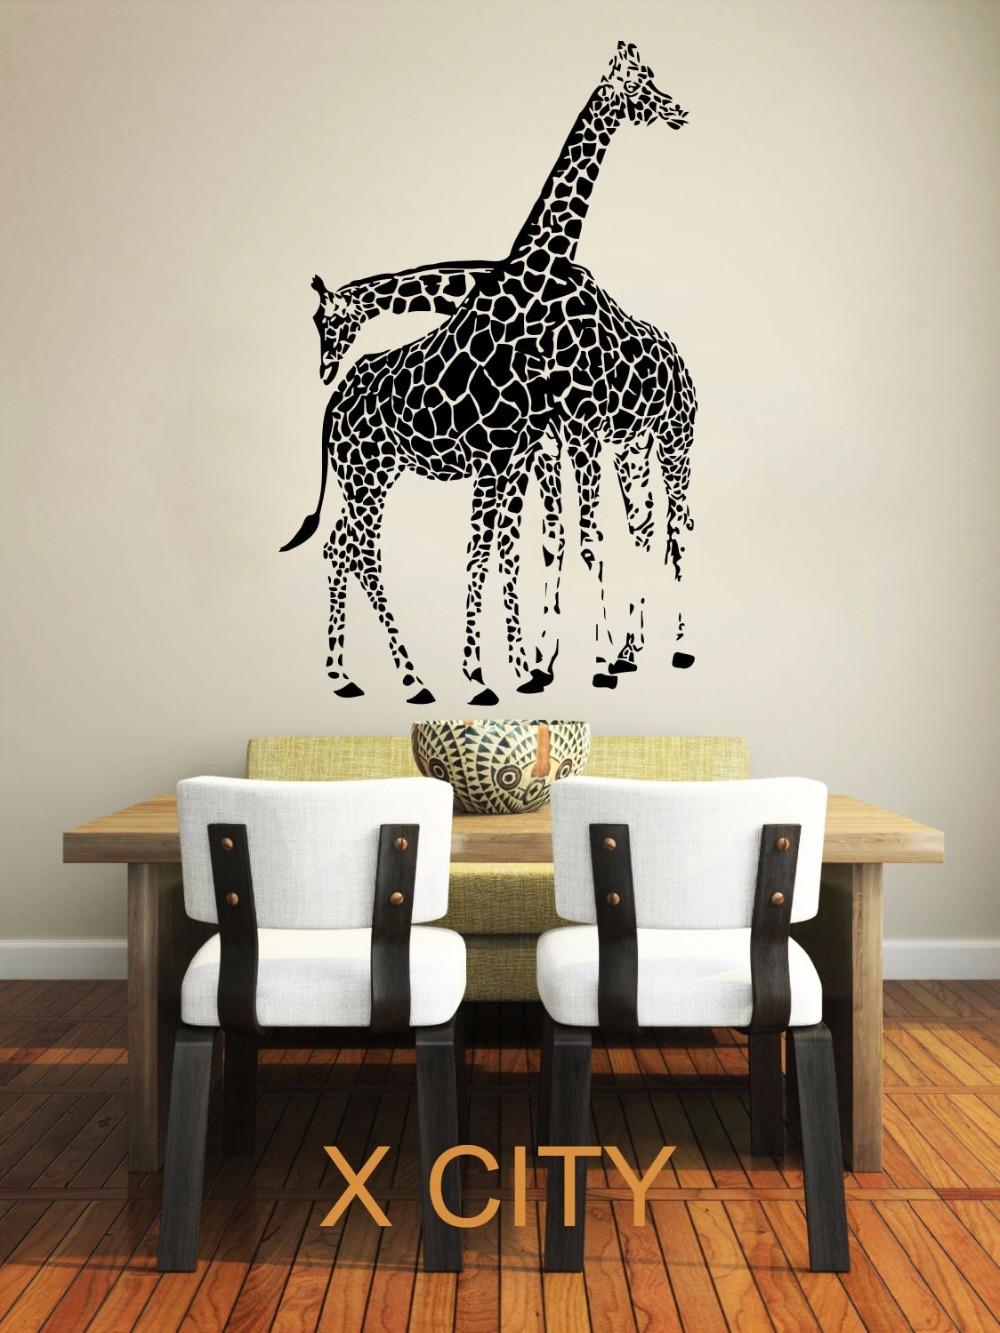 giraffe animals jungle safari african childrens decor kids vinyl sticker wall decal nursery bedroom murals playroom - Safari Decor